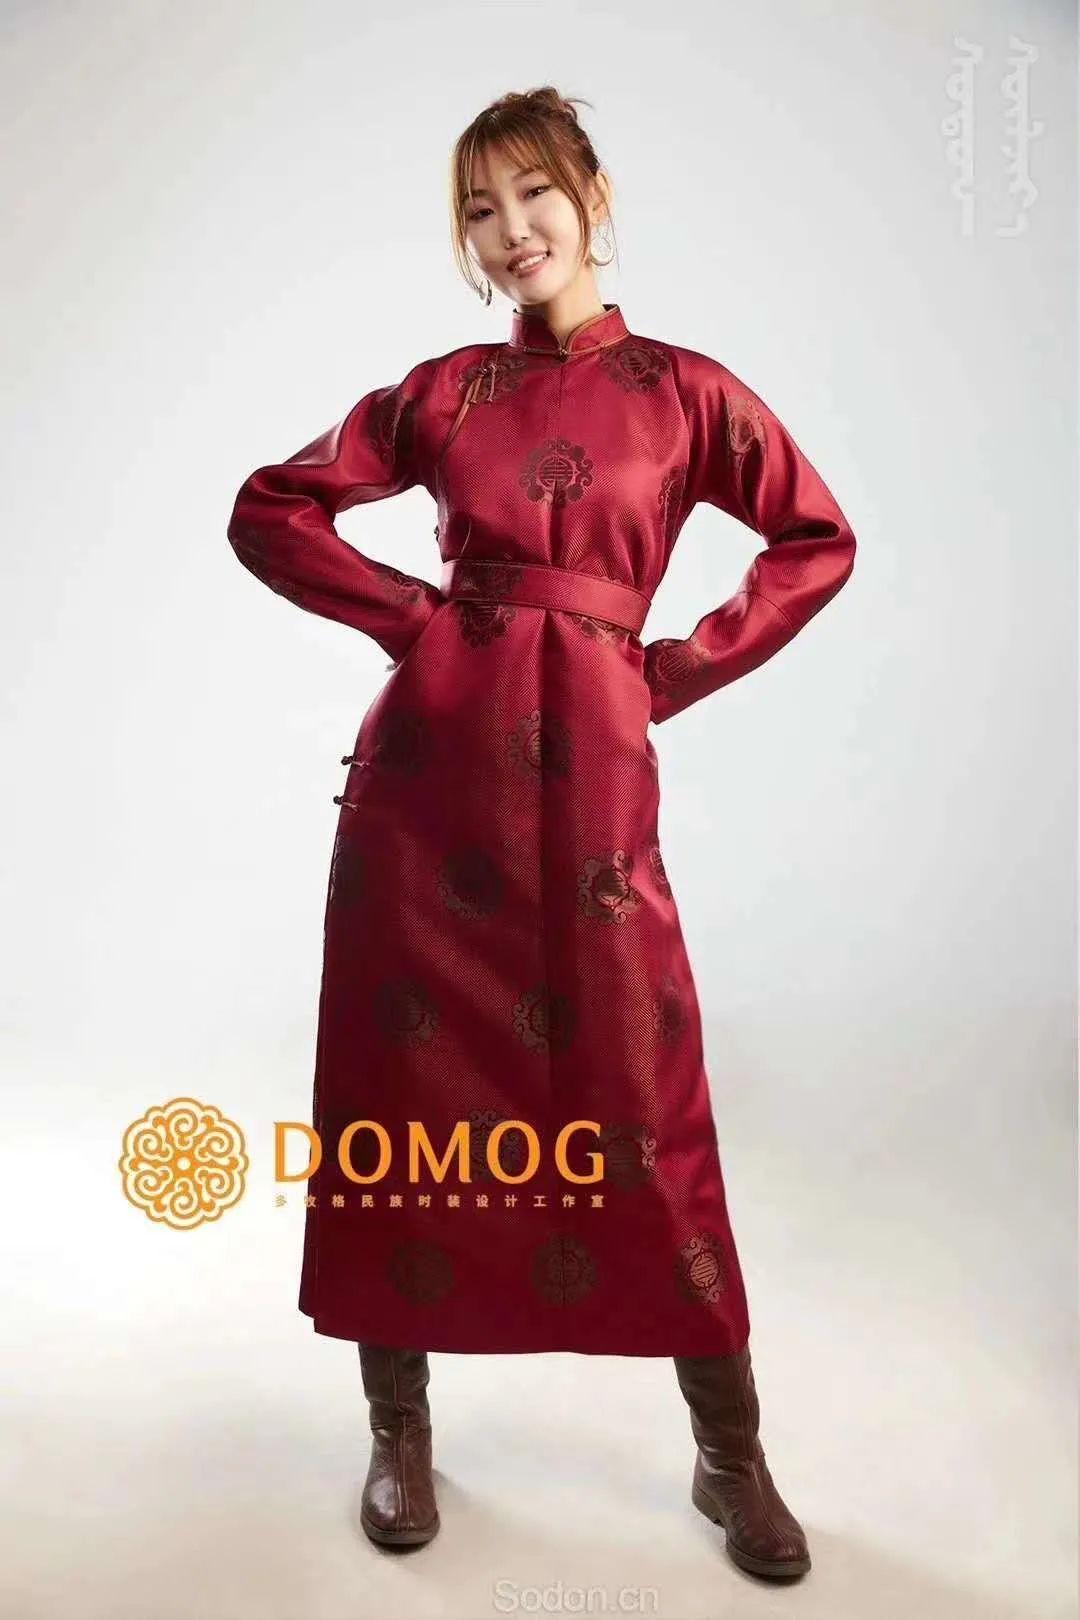 DOMOG 蒙古时装2020新款,民族与时尚的融合 第5张 DOMOG 蒙古时装2020新款,民族与时尚的融合 蒙古服饰